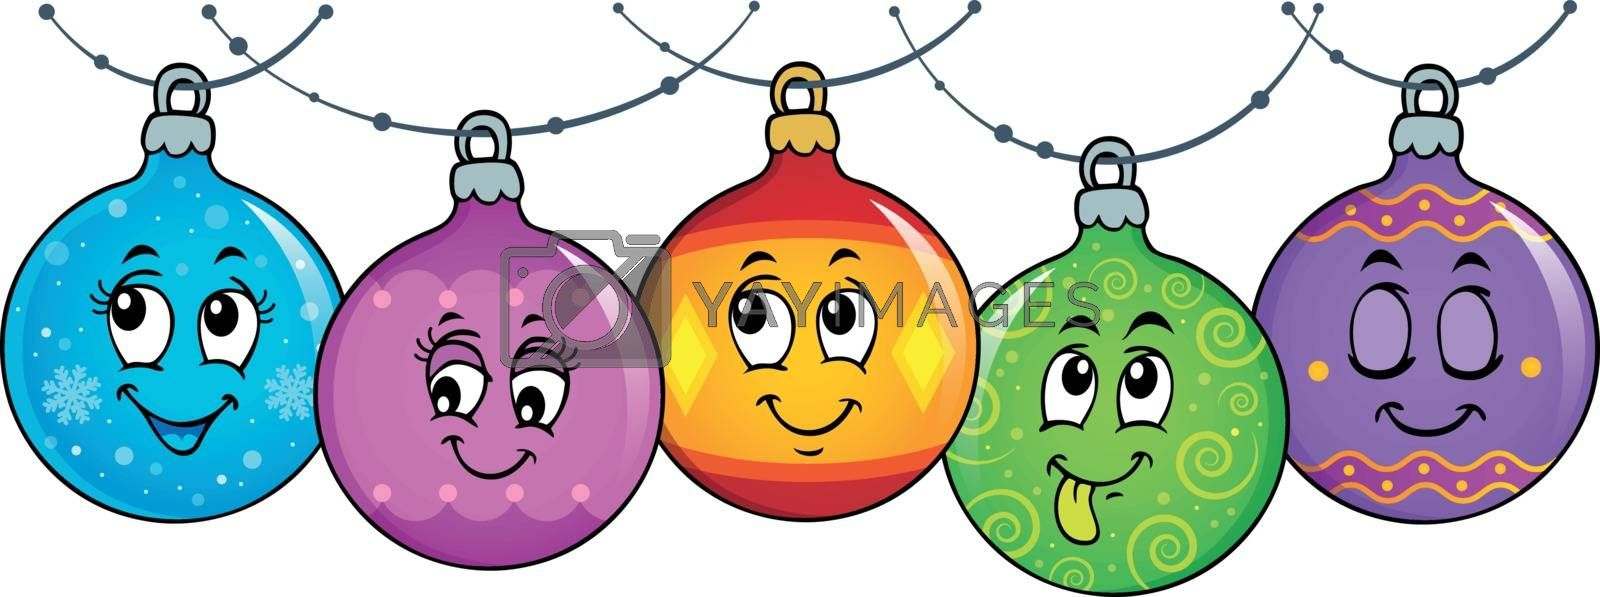 Happy Christmas ornaments theme image 3 - eps10 vector illustration.